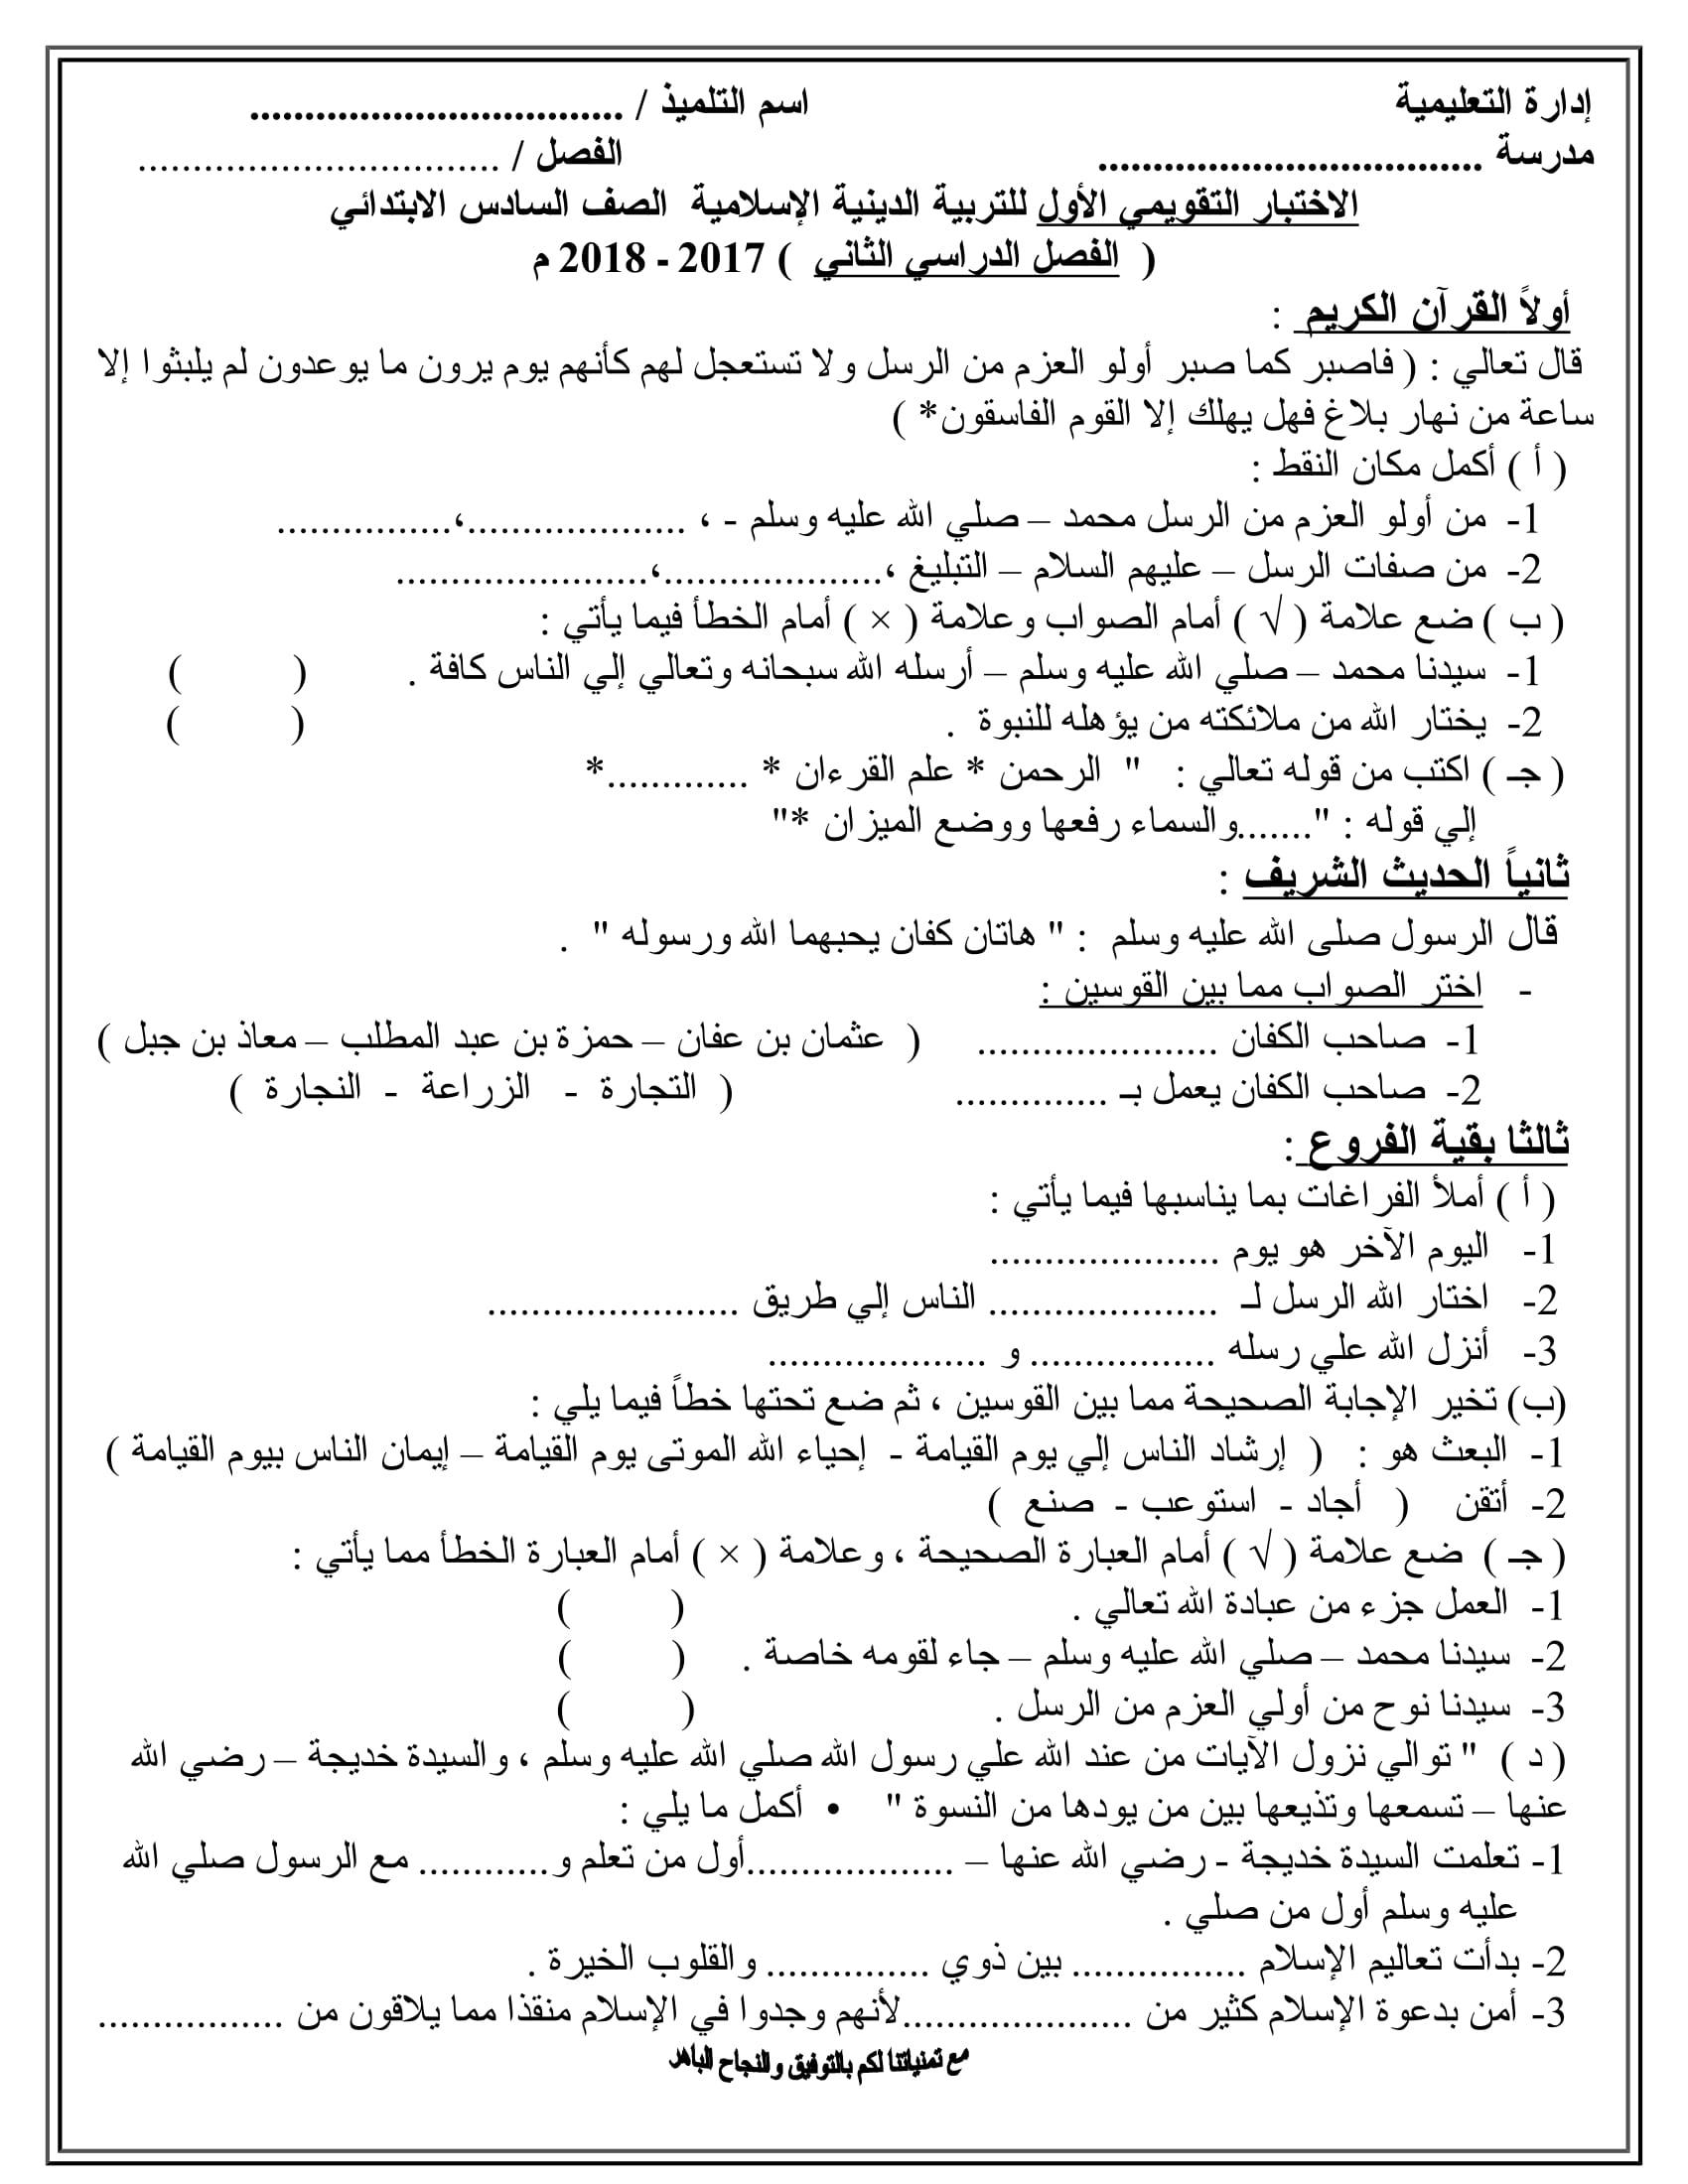 exam-eg.com_152485067250481.jpg